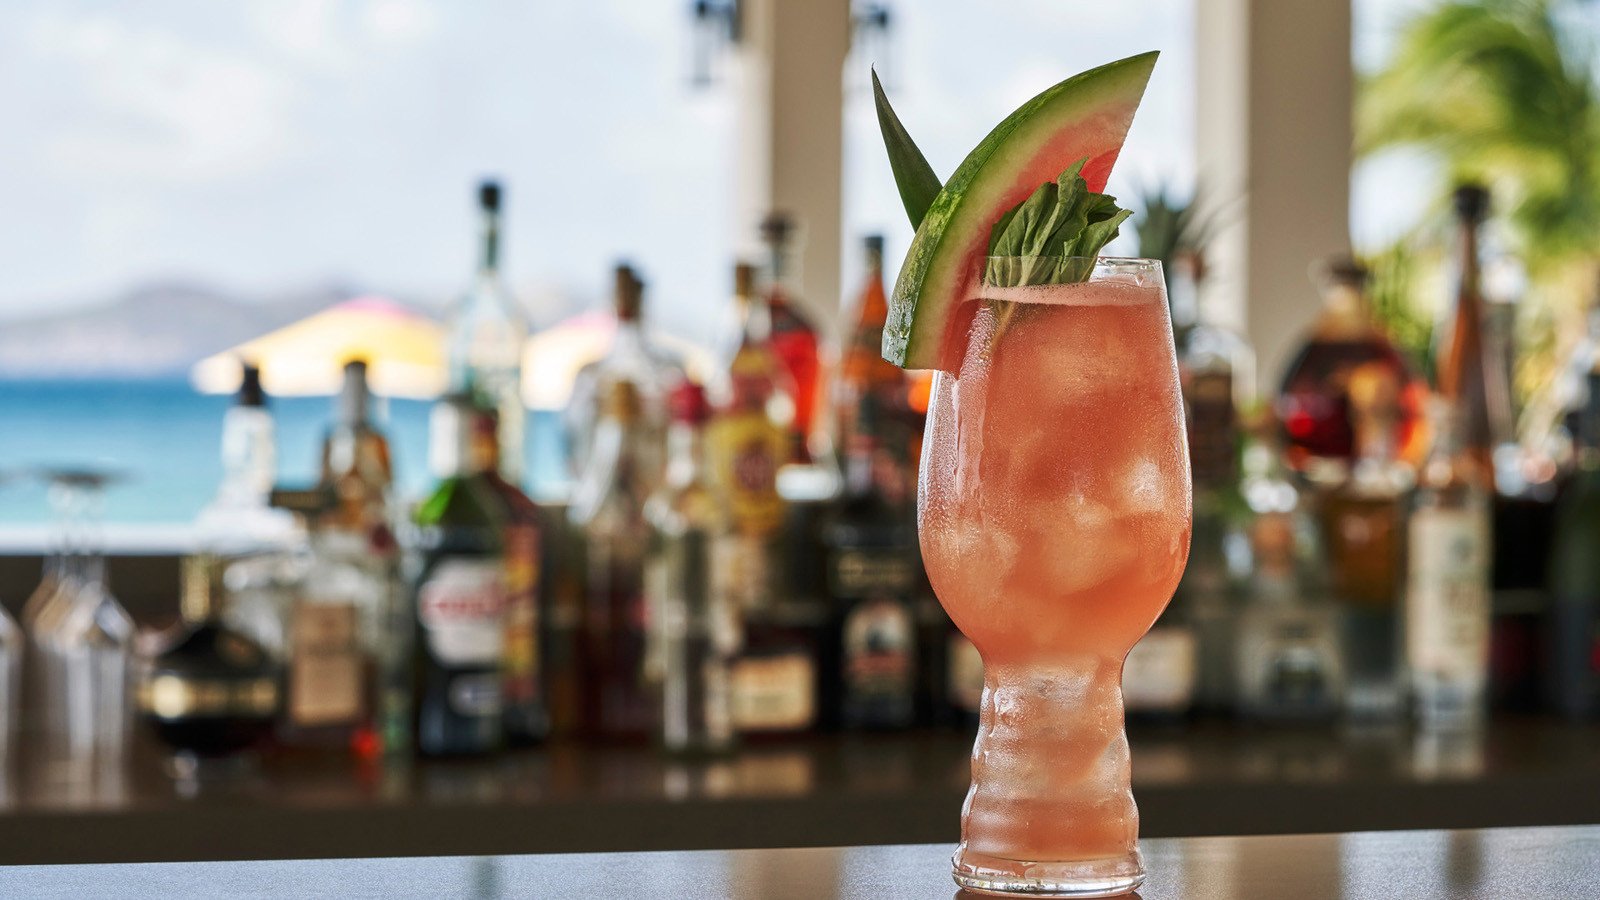 news-main-four-seasons-resort-nevis-celebrates-national-rum-month.1627422745.jpg